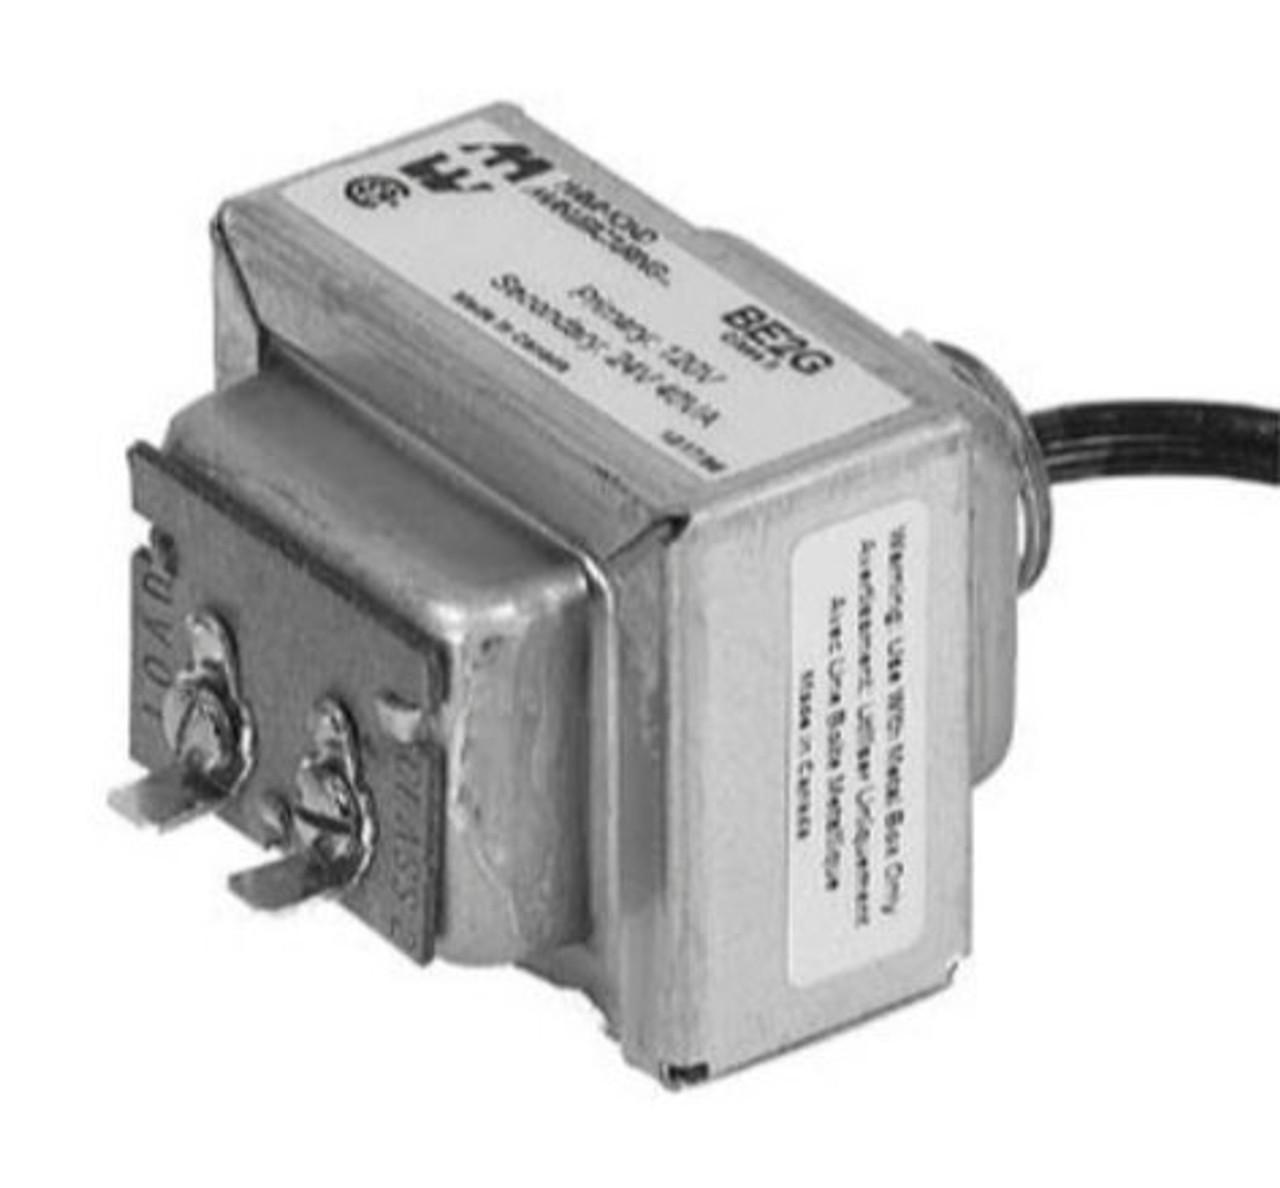 AC-CL2T-120B12